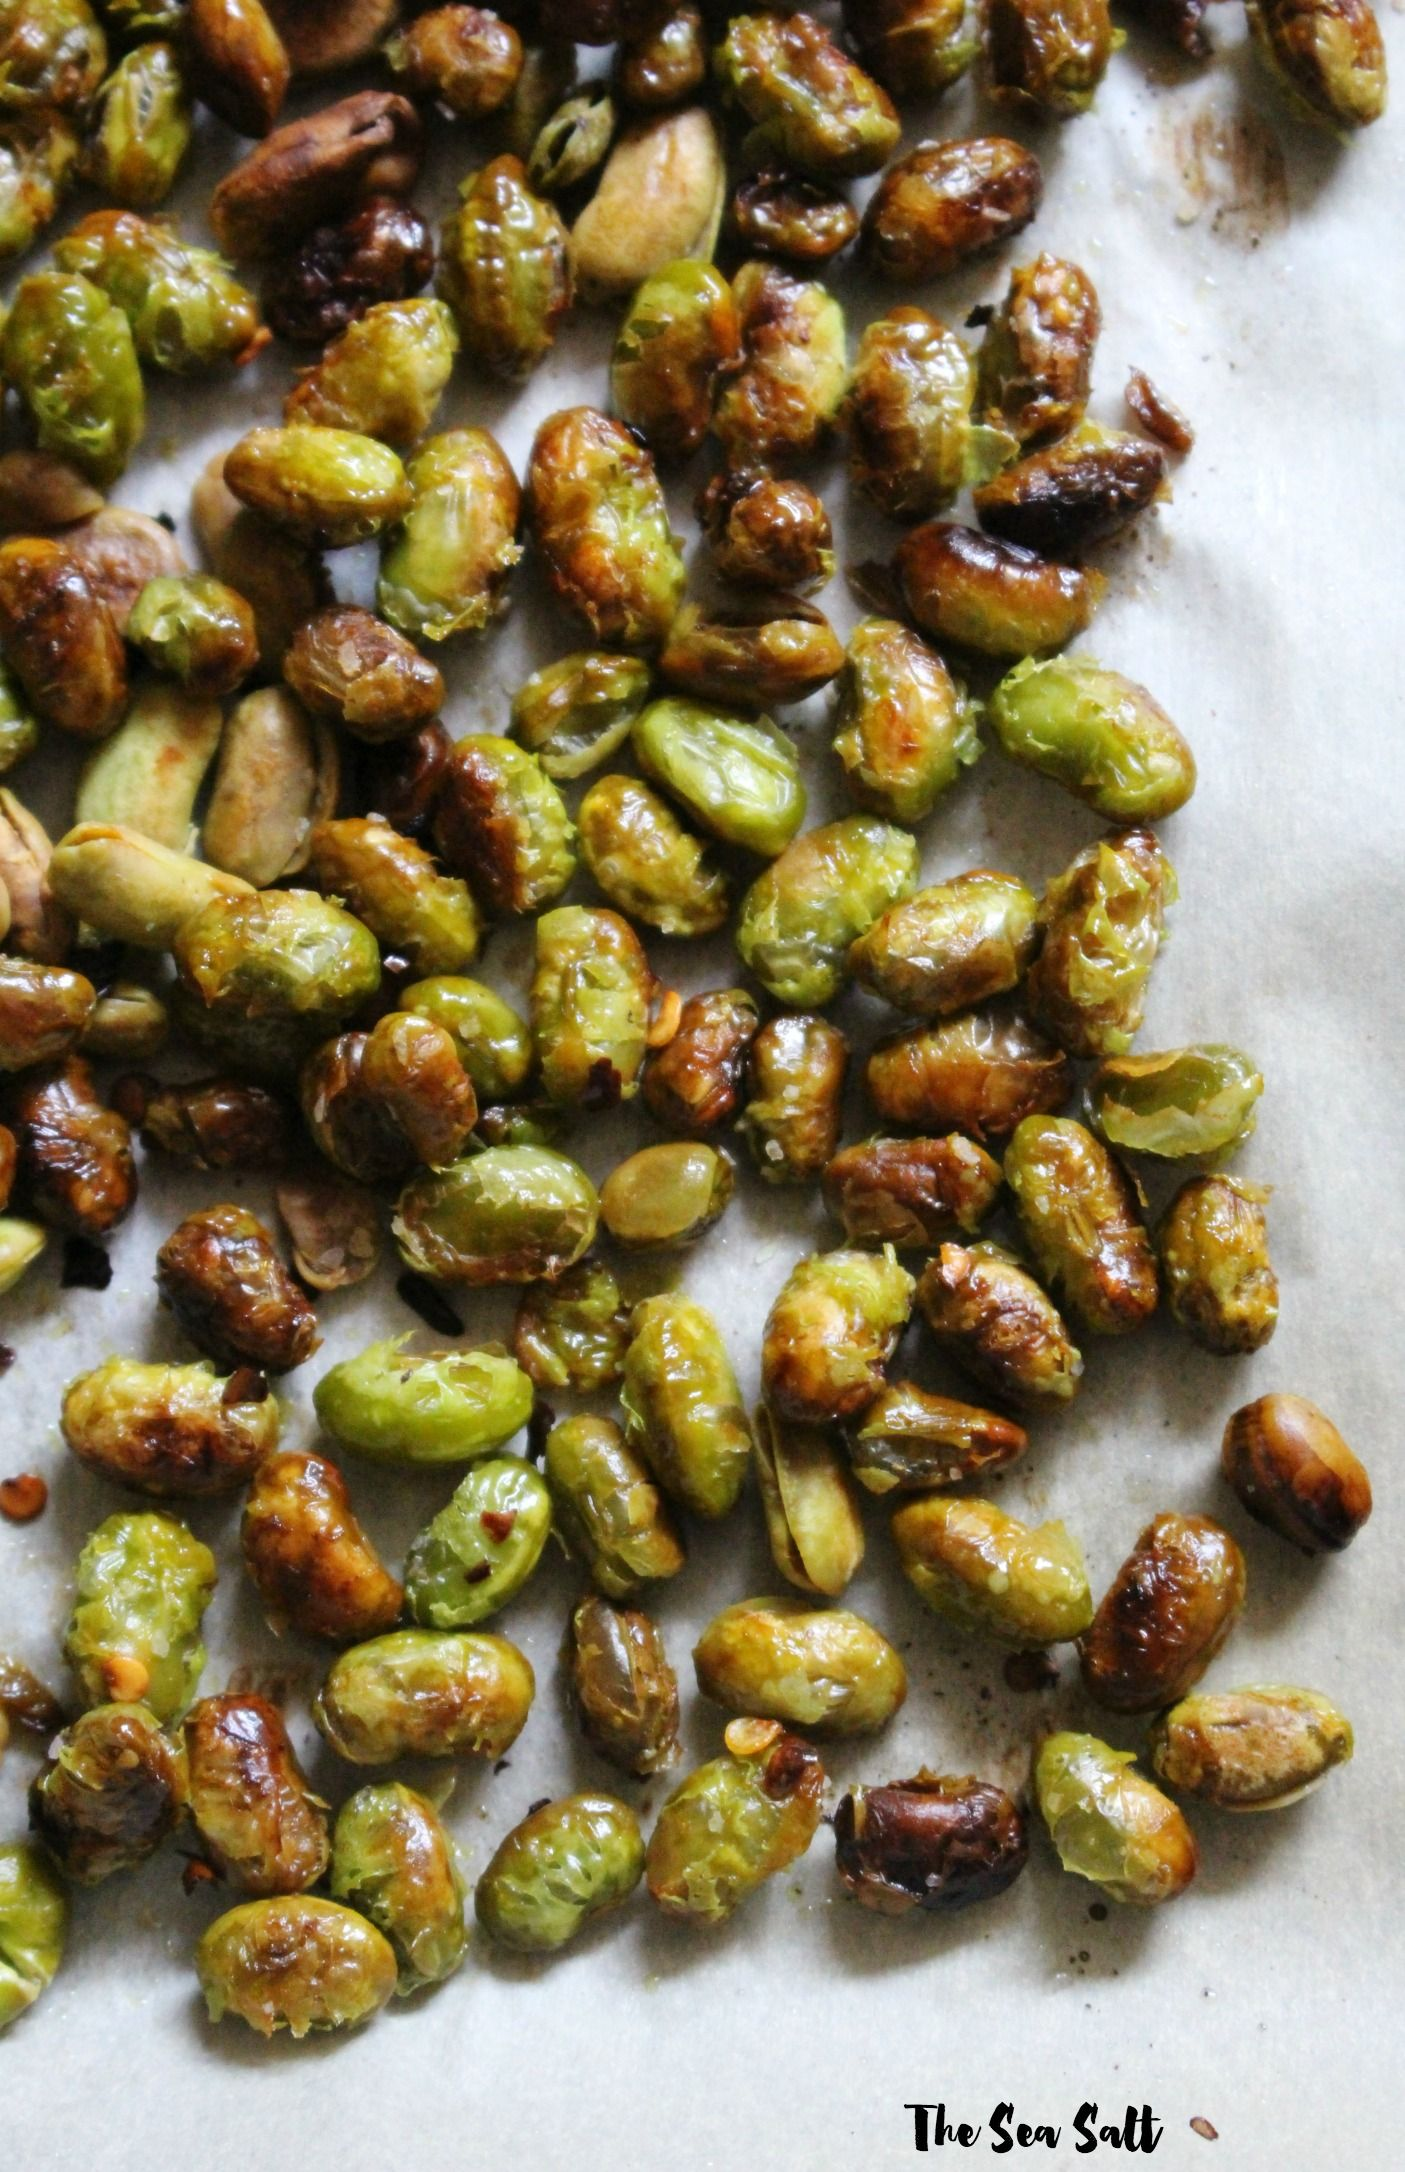 Crunchy Roasted Edamame Recipe Healthy Vegan Snacks Roasted